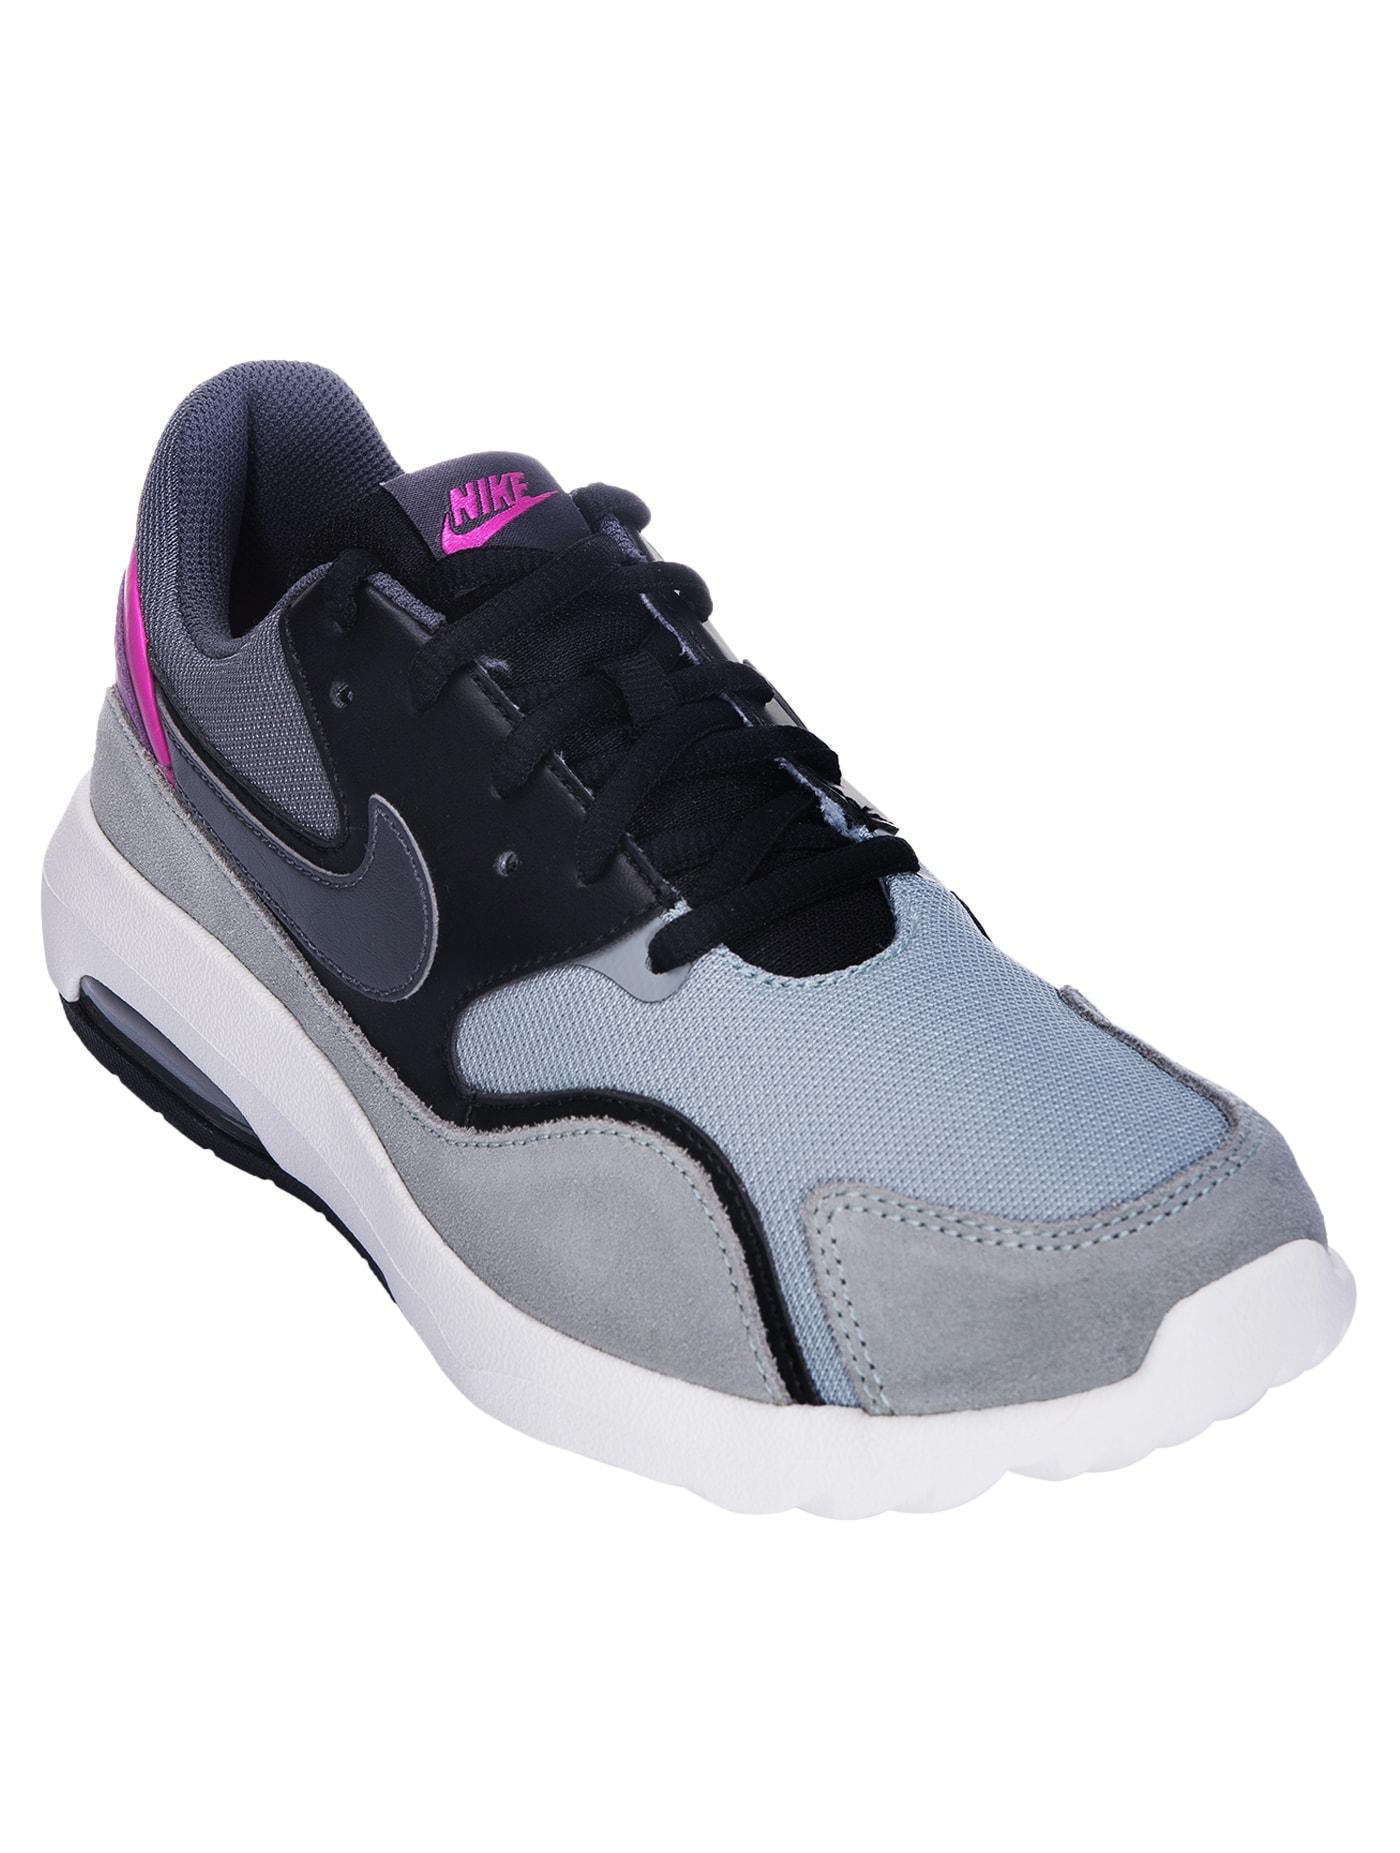 NIKE รองเท้าลำลองผู้หญิง รุ่น Air Max Nostalgic 91678